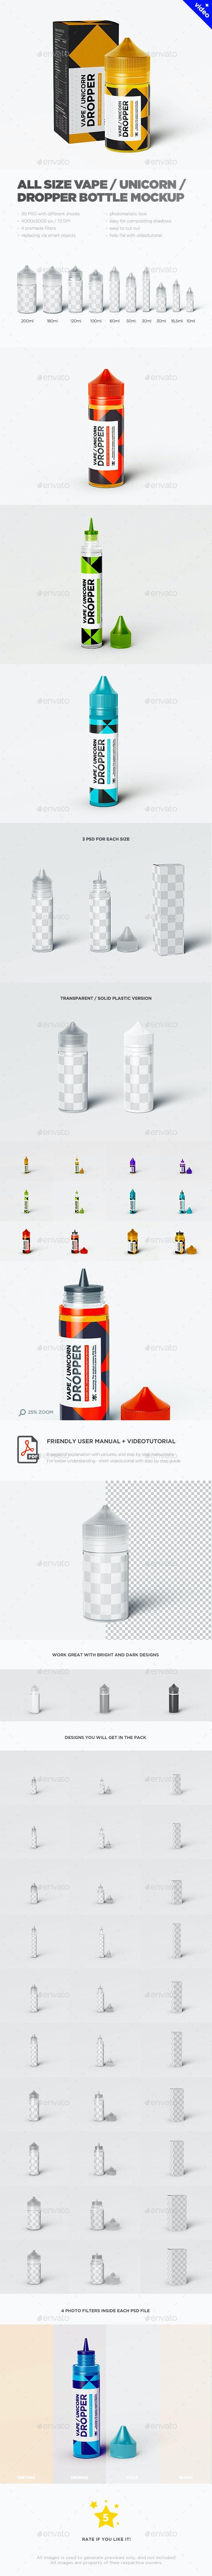 All Sizes Vape / Unicorn / Dropper Bottle MockUp - Miscellaneous Packaging